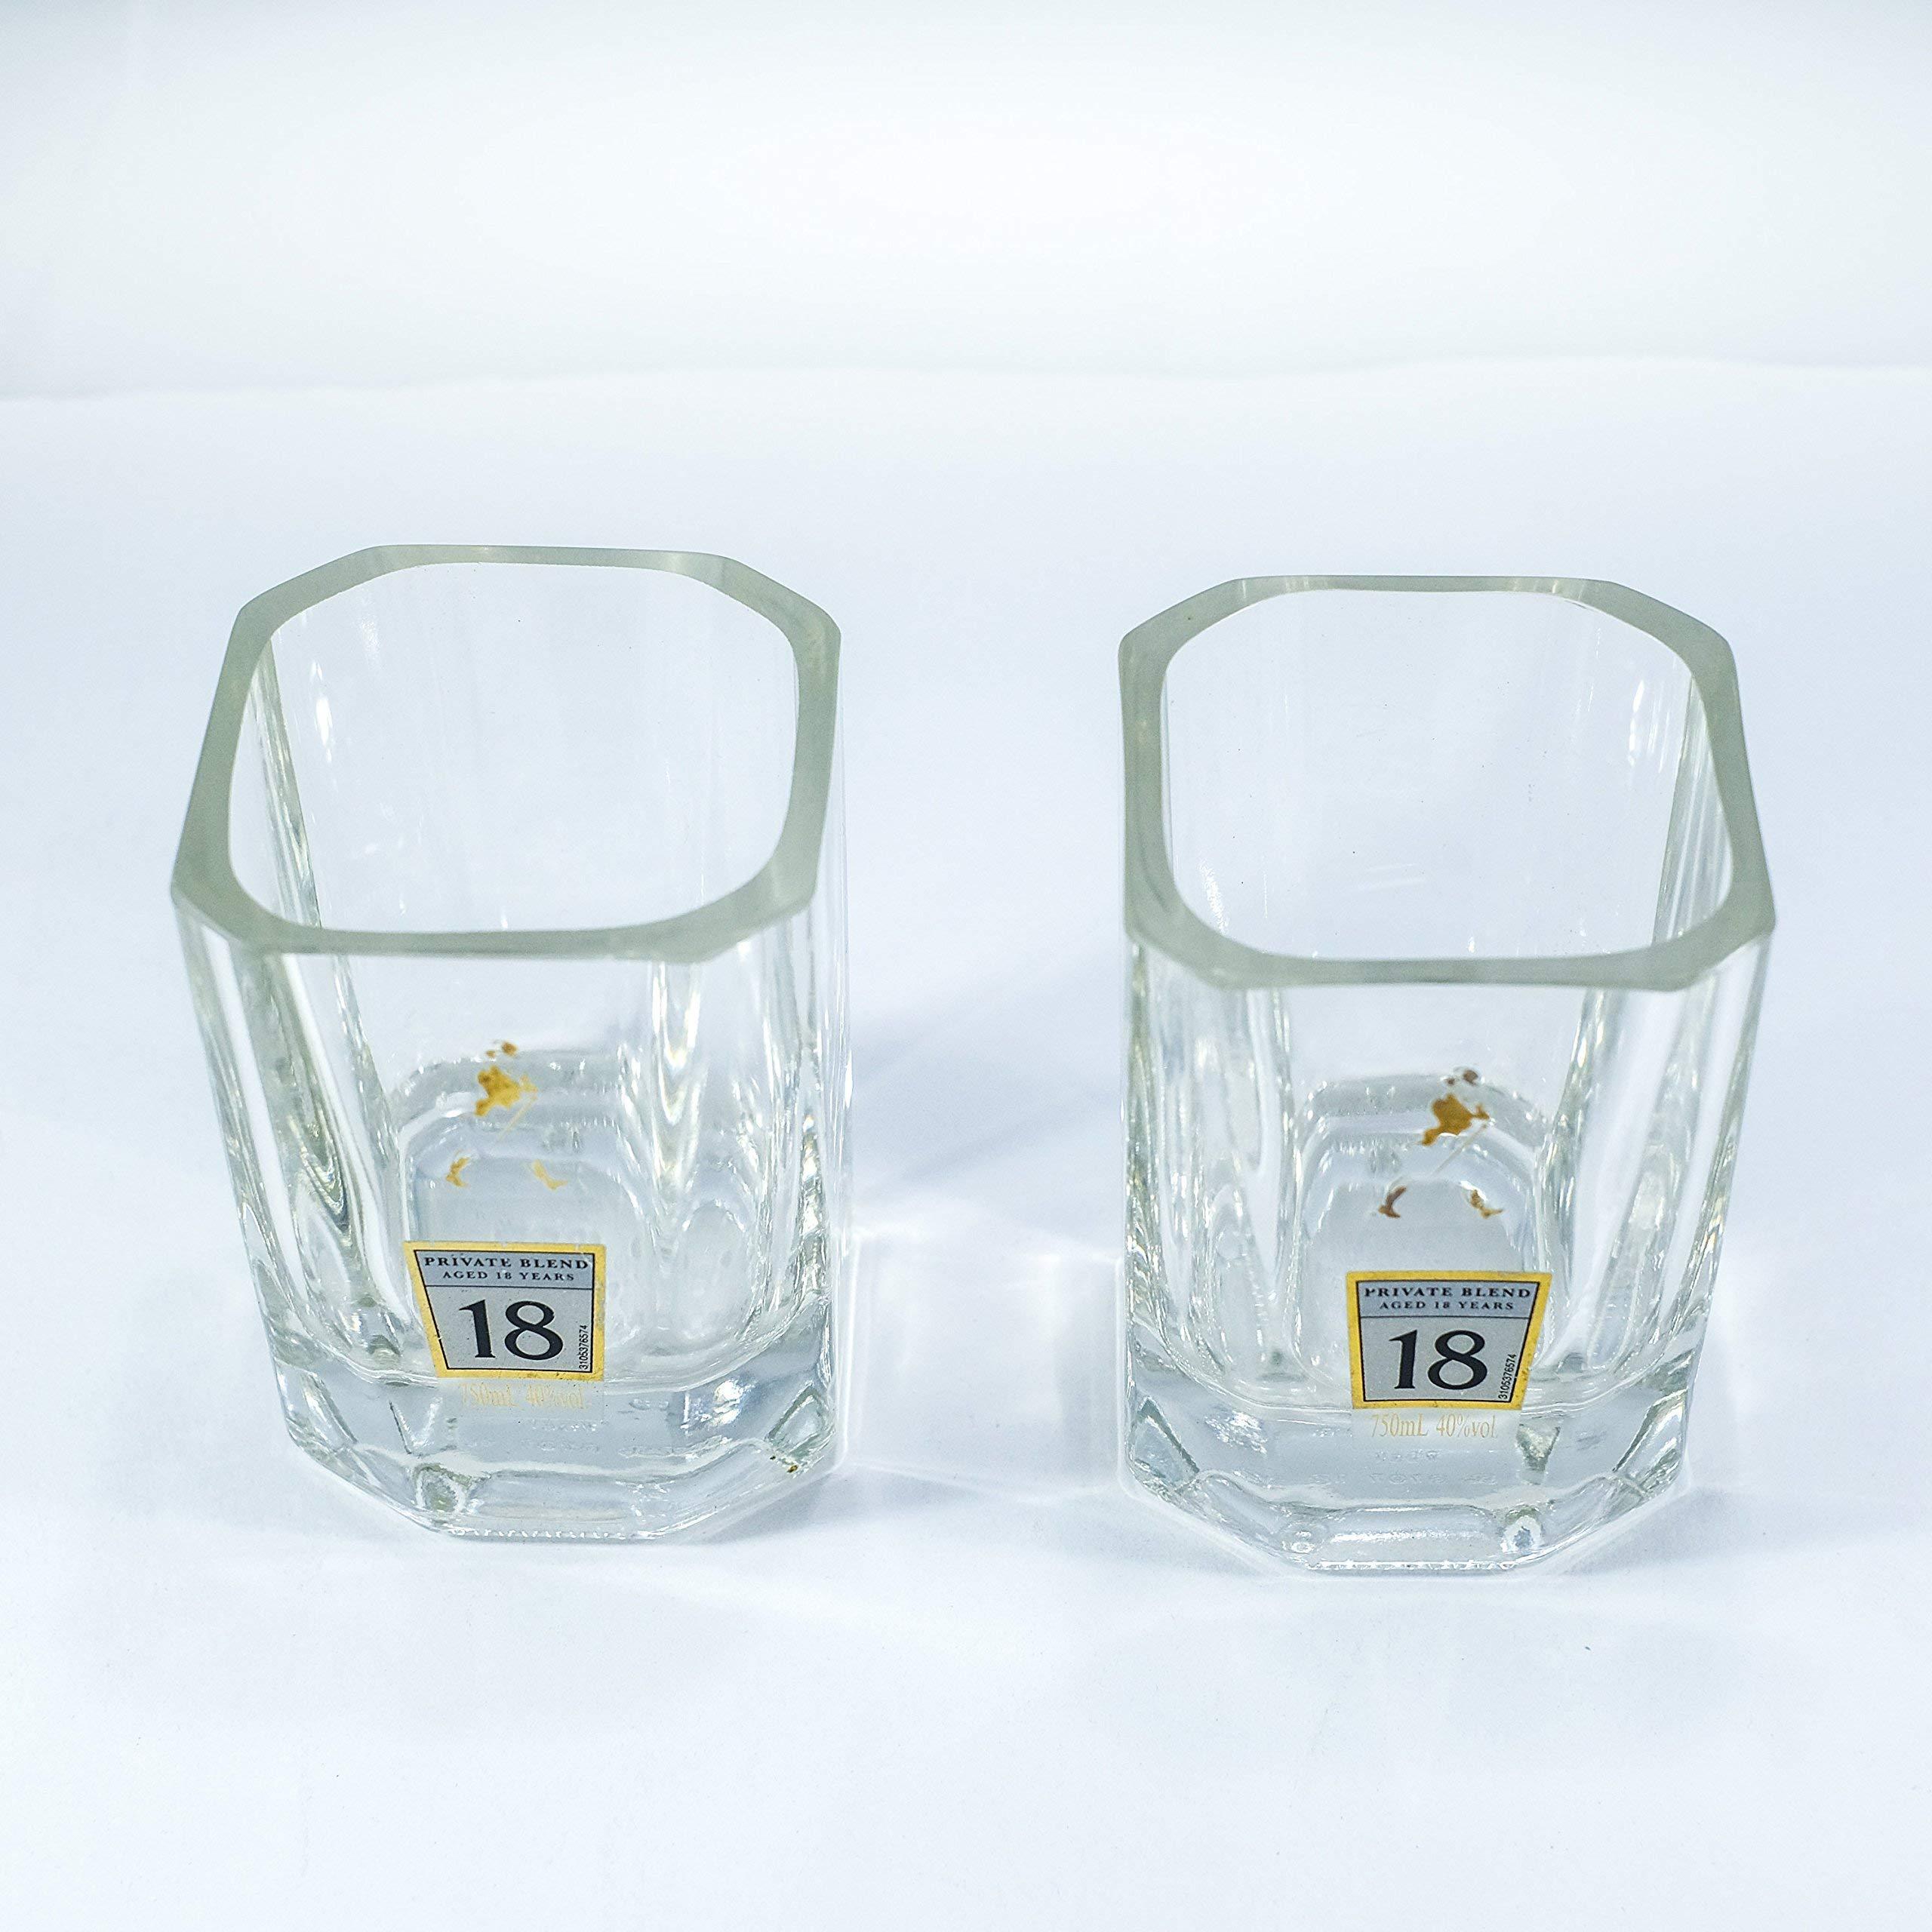 Scotch Glasses made from Johnnie Walker Platinum Label 18 Year bottle